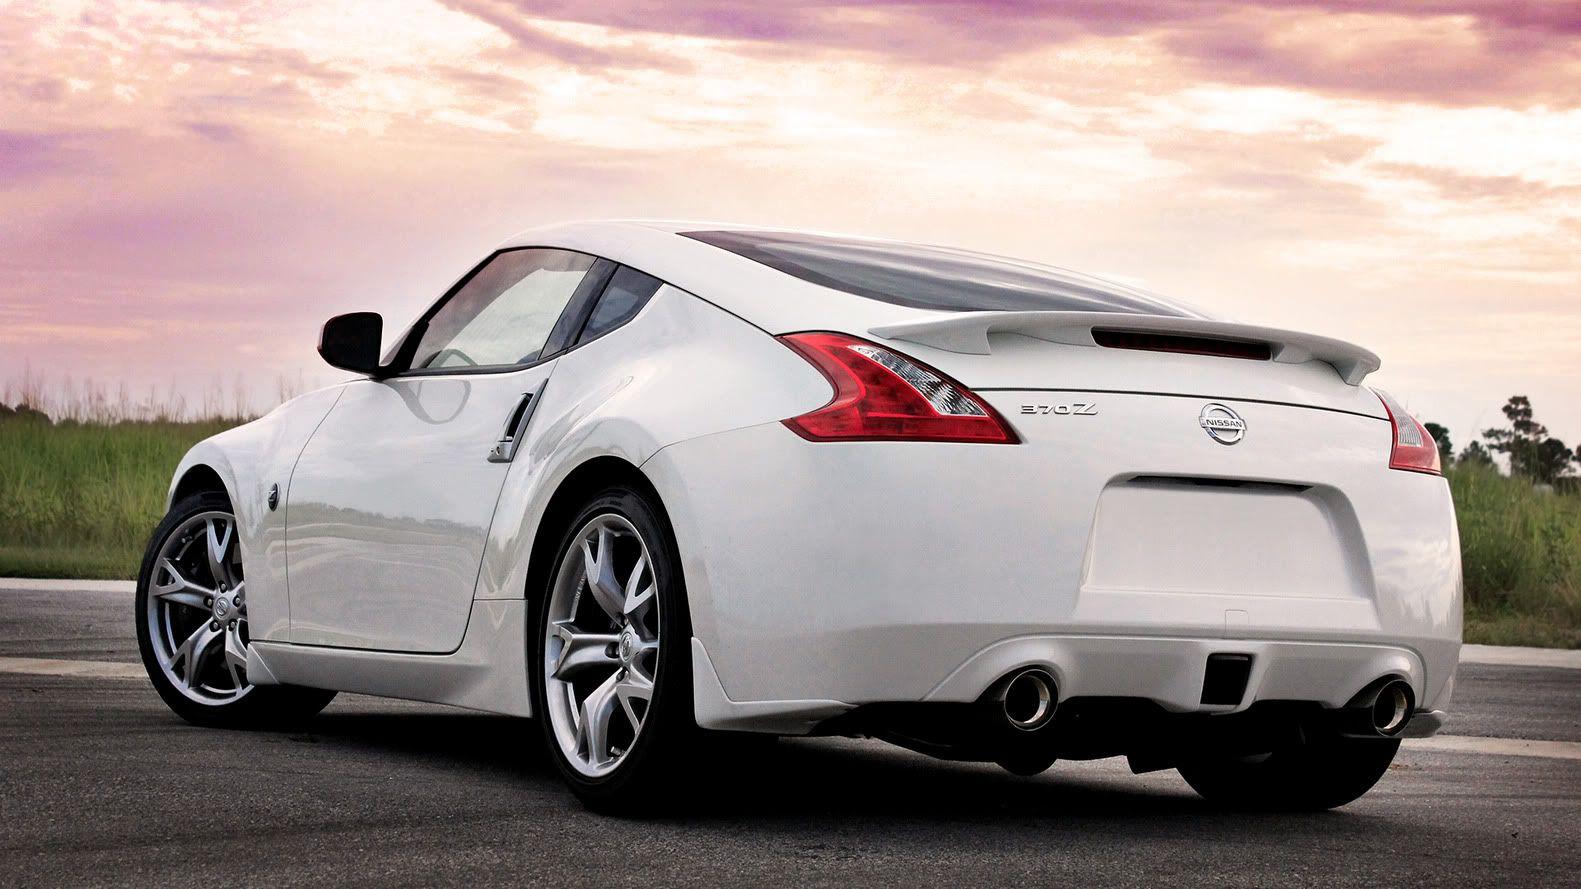 Merveilleux White Nissan 370Z Coupe